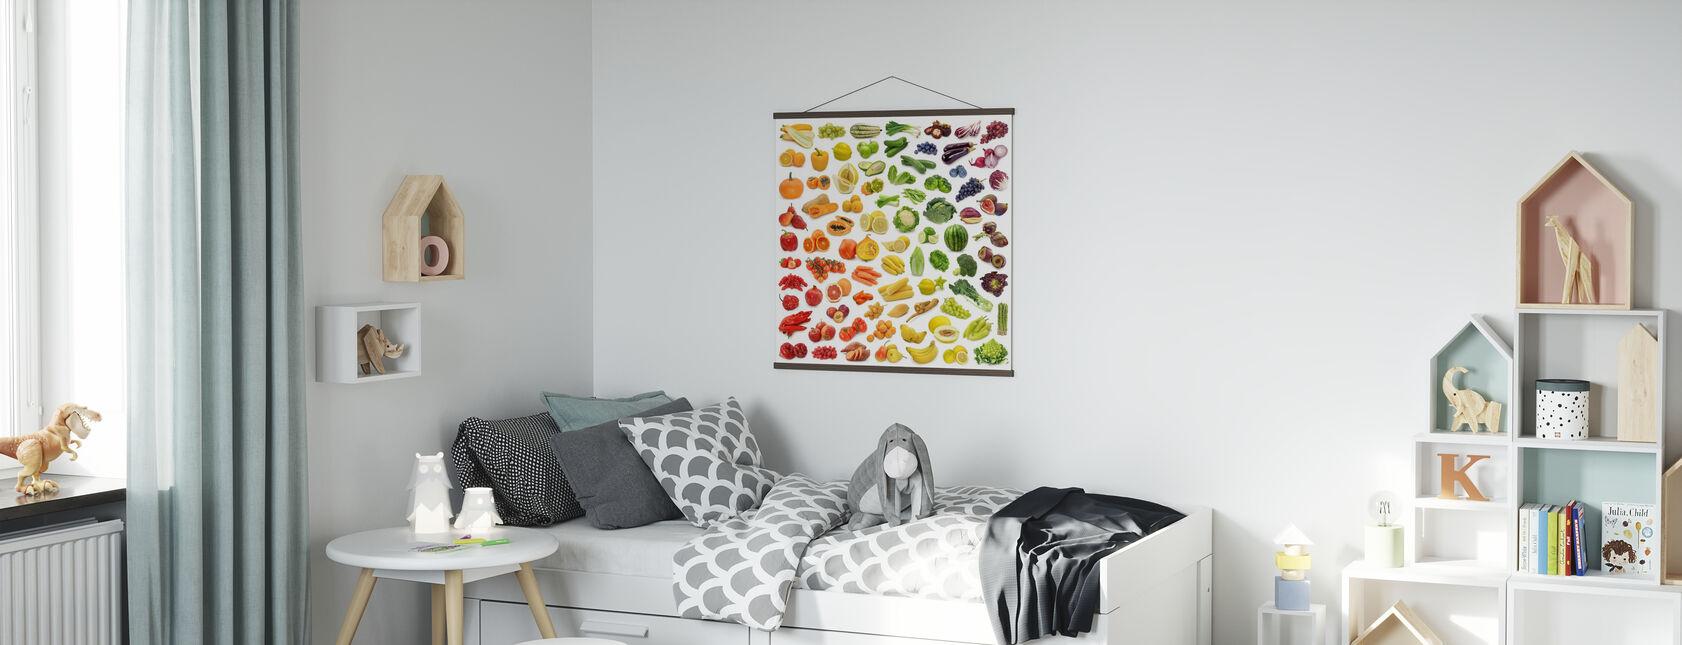 Saftige Früchte - Poster - Kinderzimmer